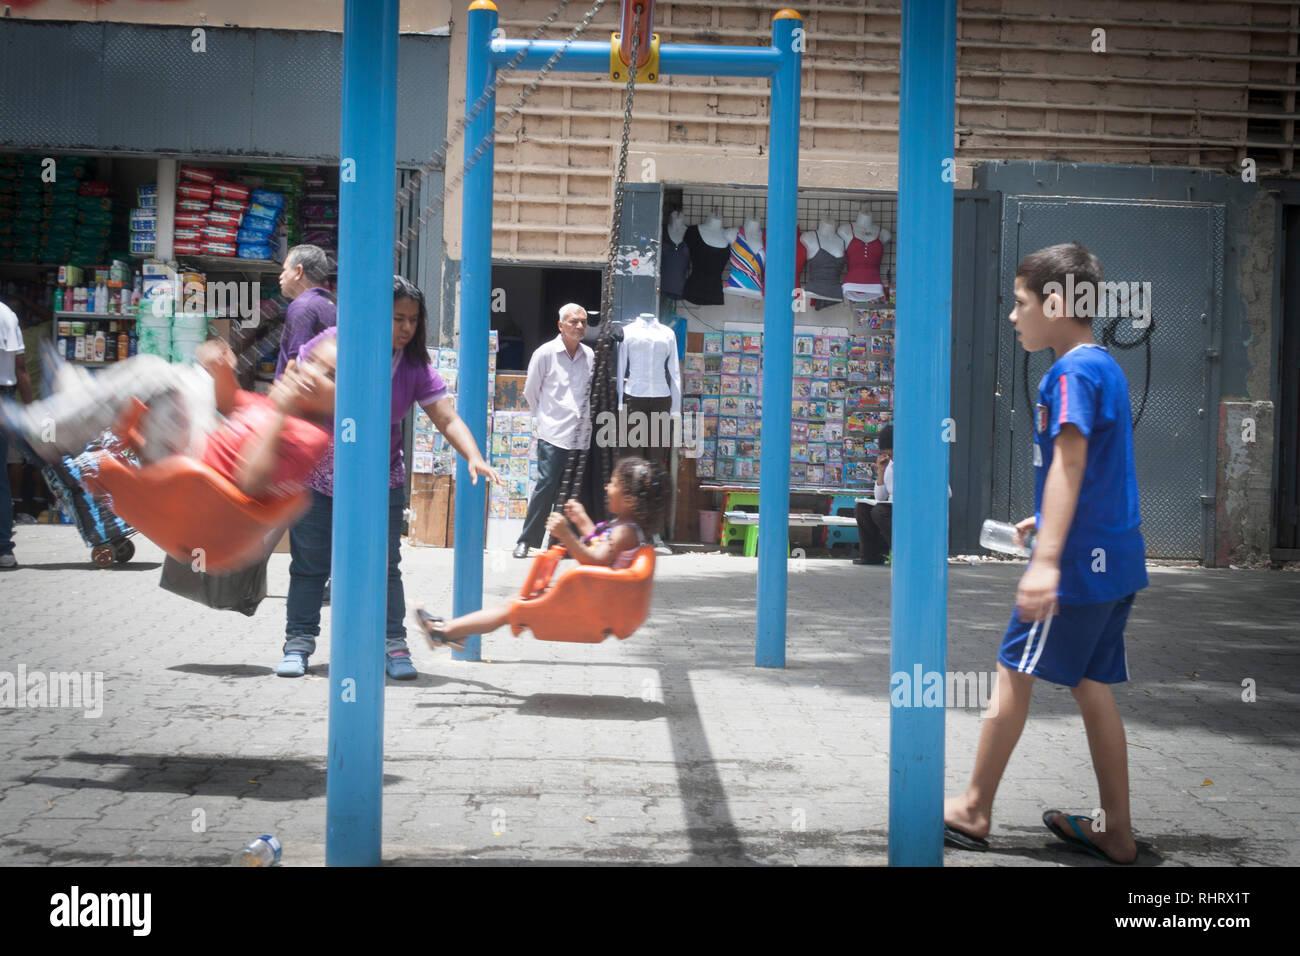 Caracas, Dtto Capital / Venezuela - 03/05/2013. Children enjoying games on the boulevard of Catia. - Stock Image